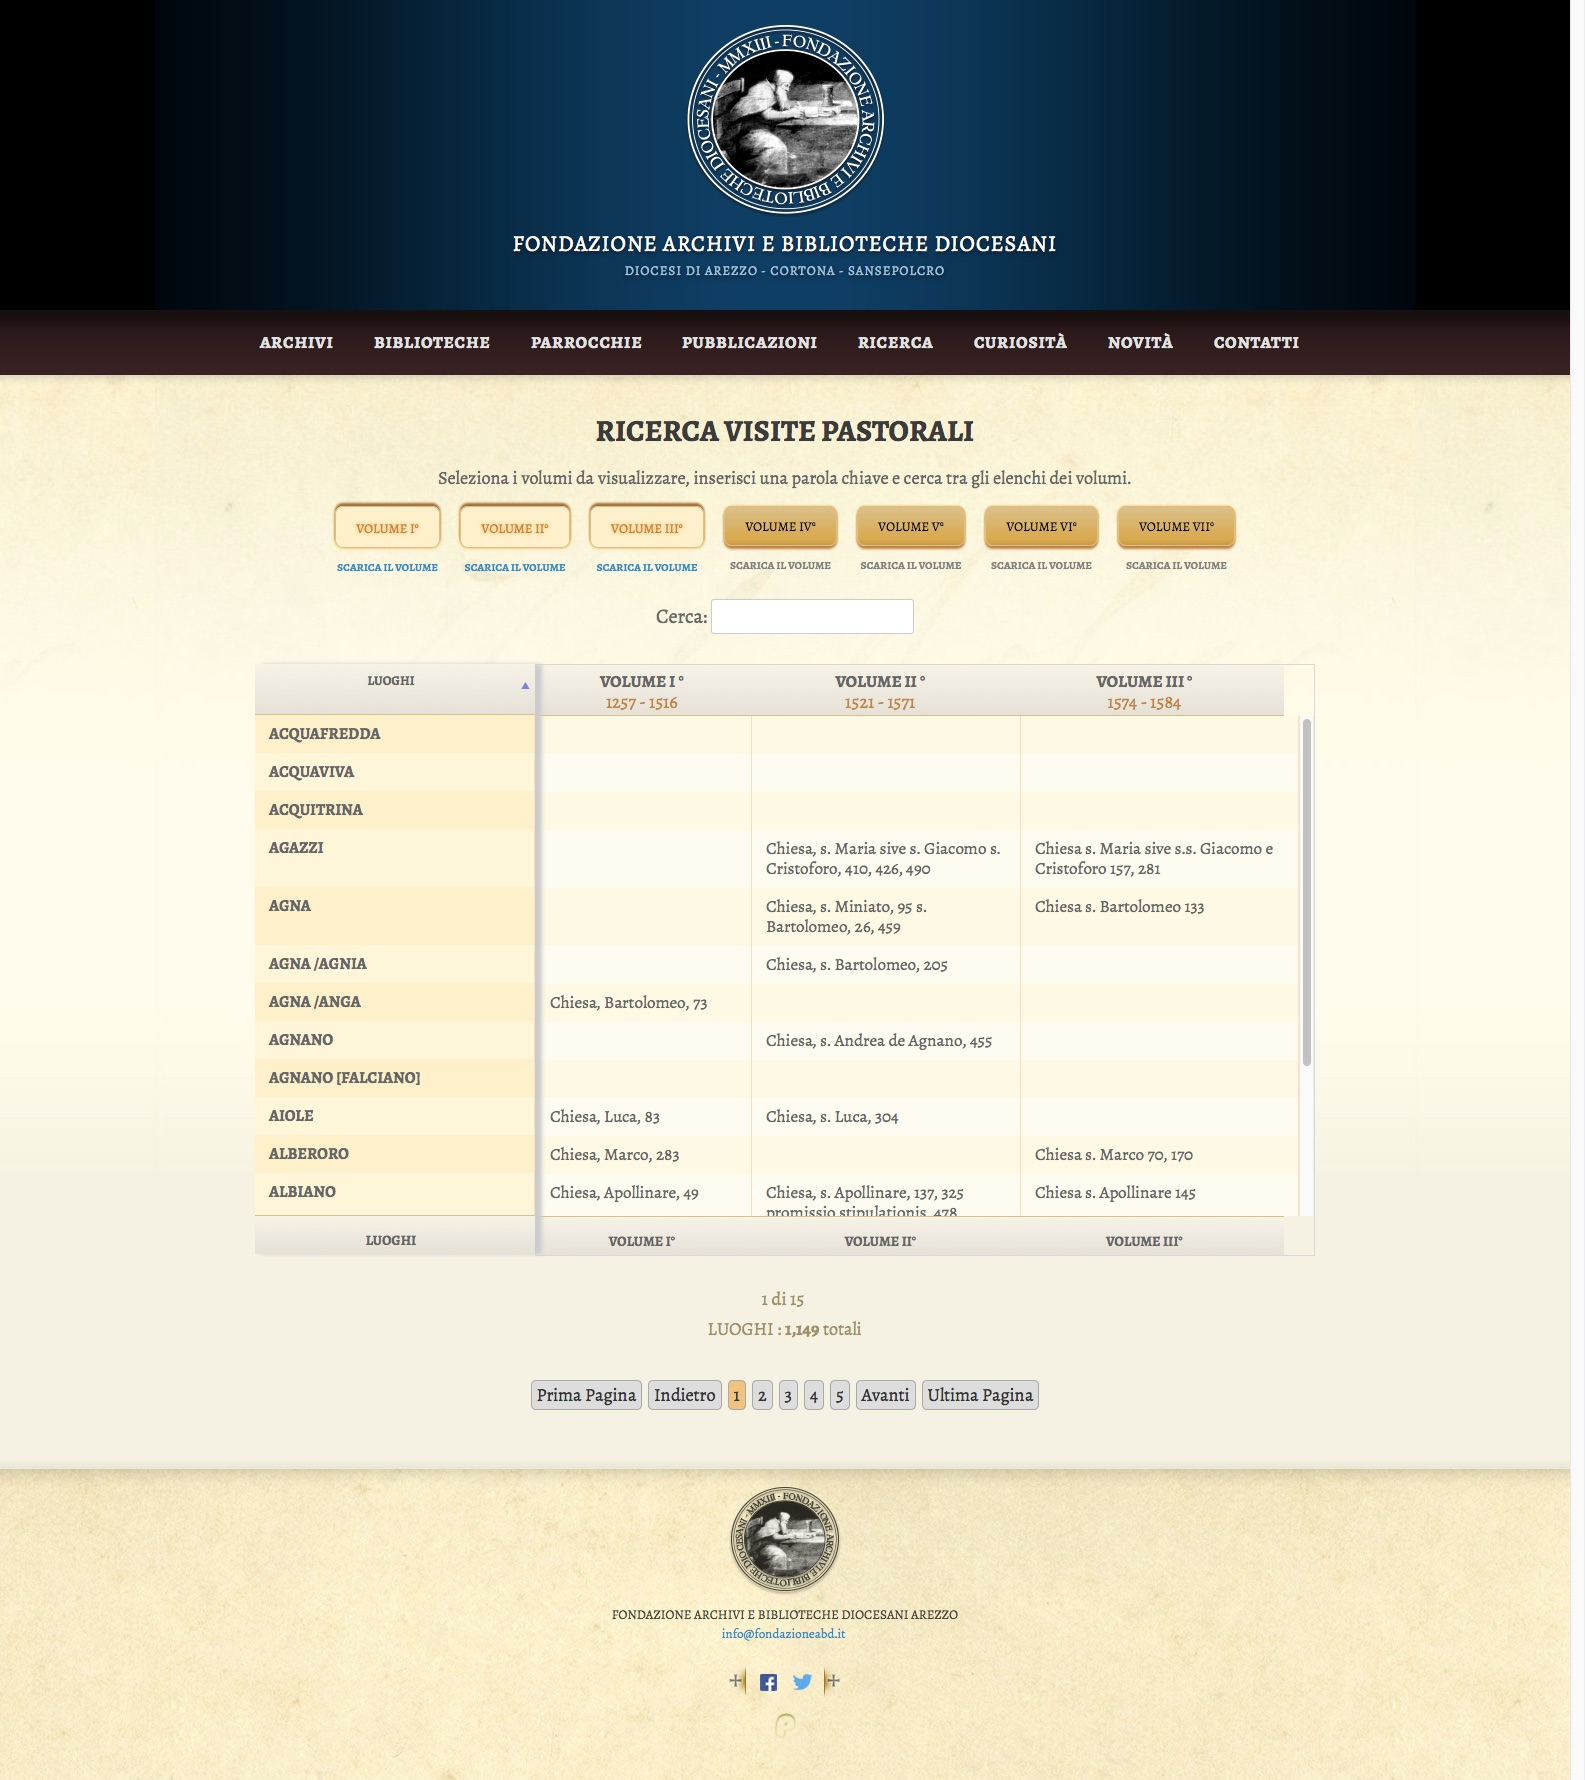 Ricerca-Visite-Pastorali-Fondazione-Archivi-Biblioteche-Diocesane-20141129.jpg